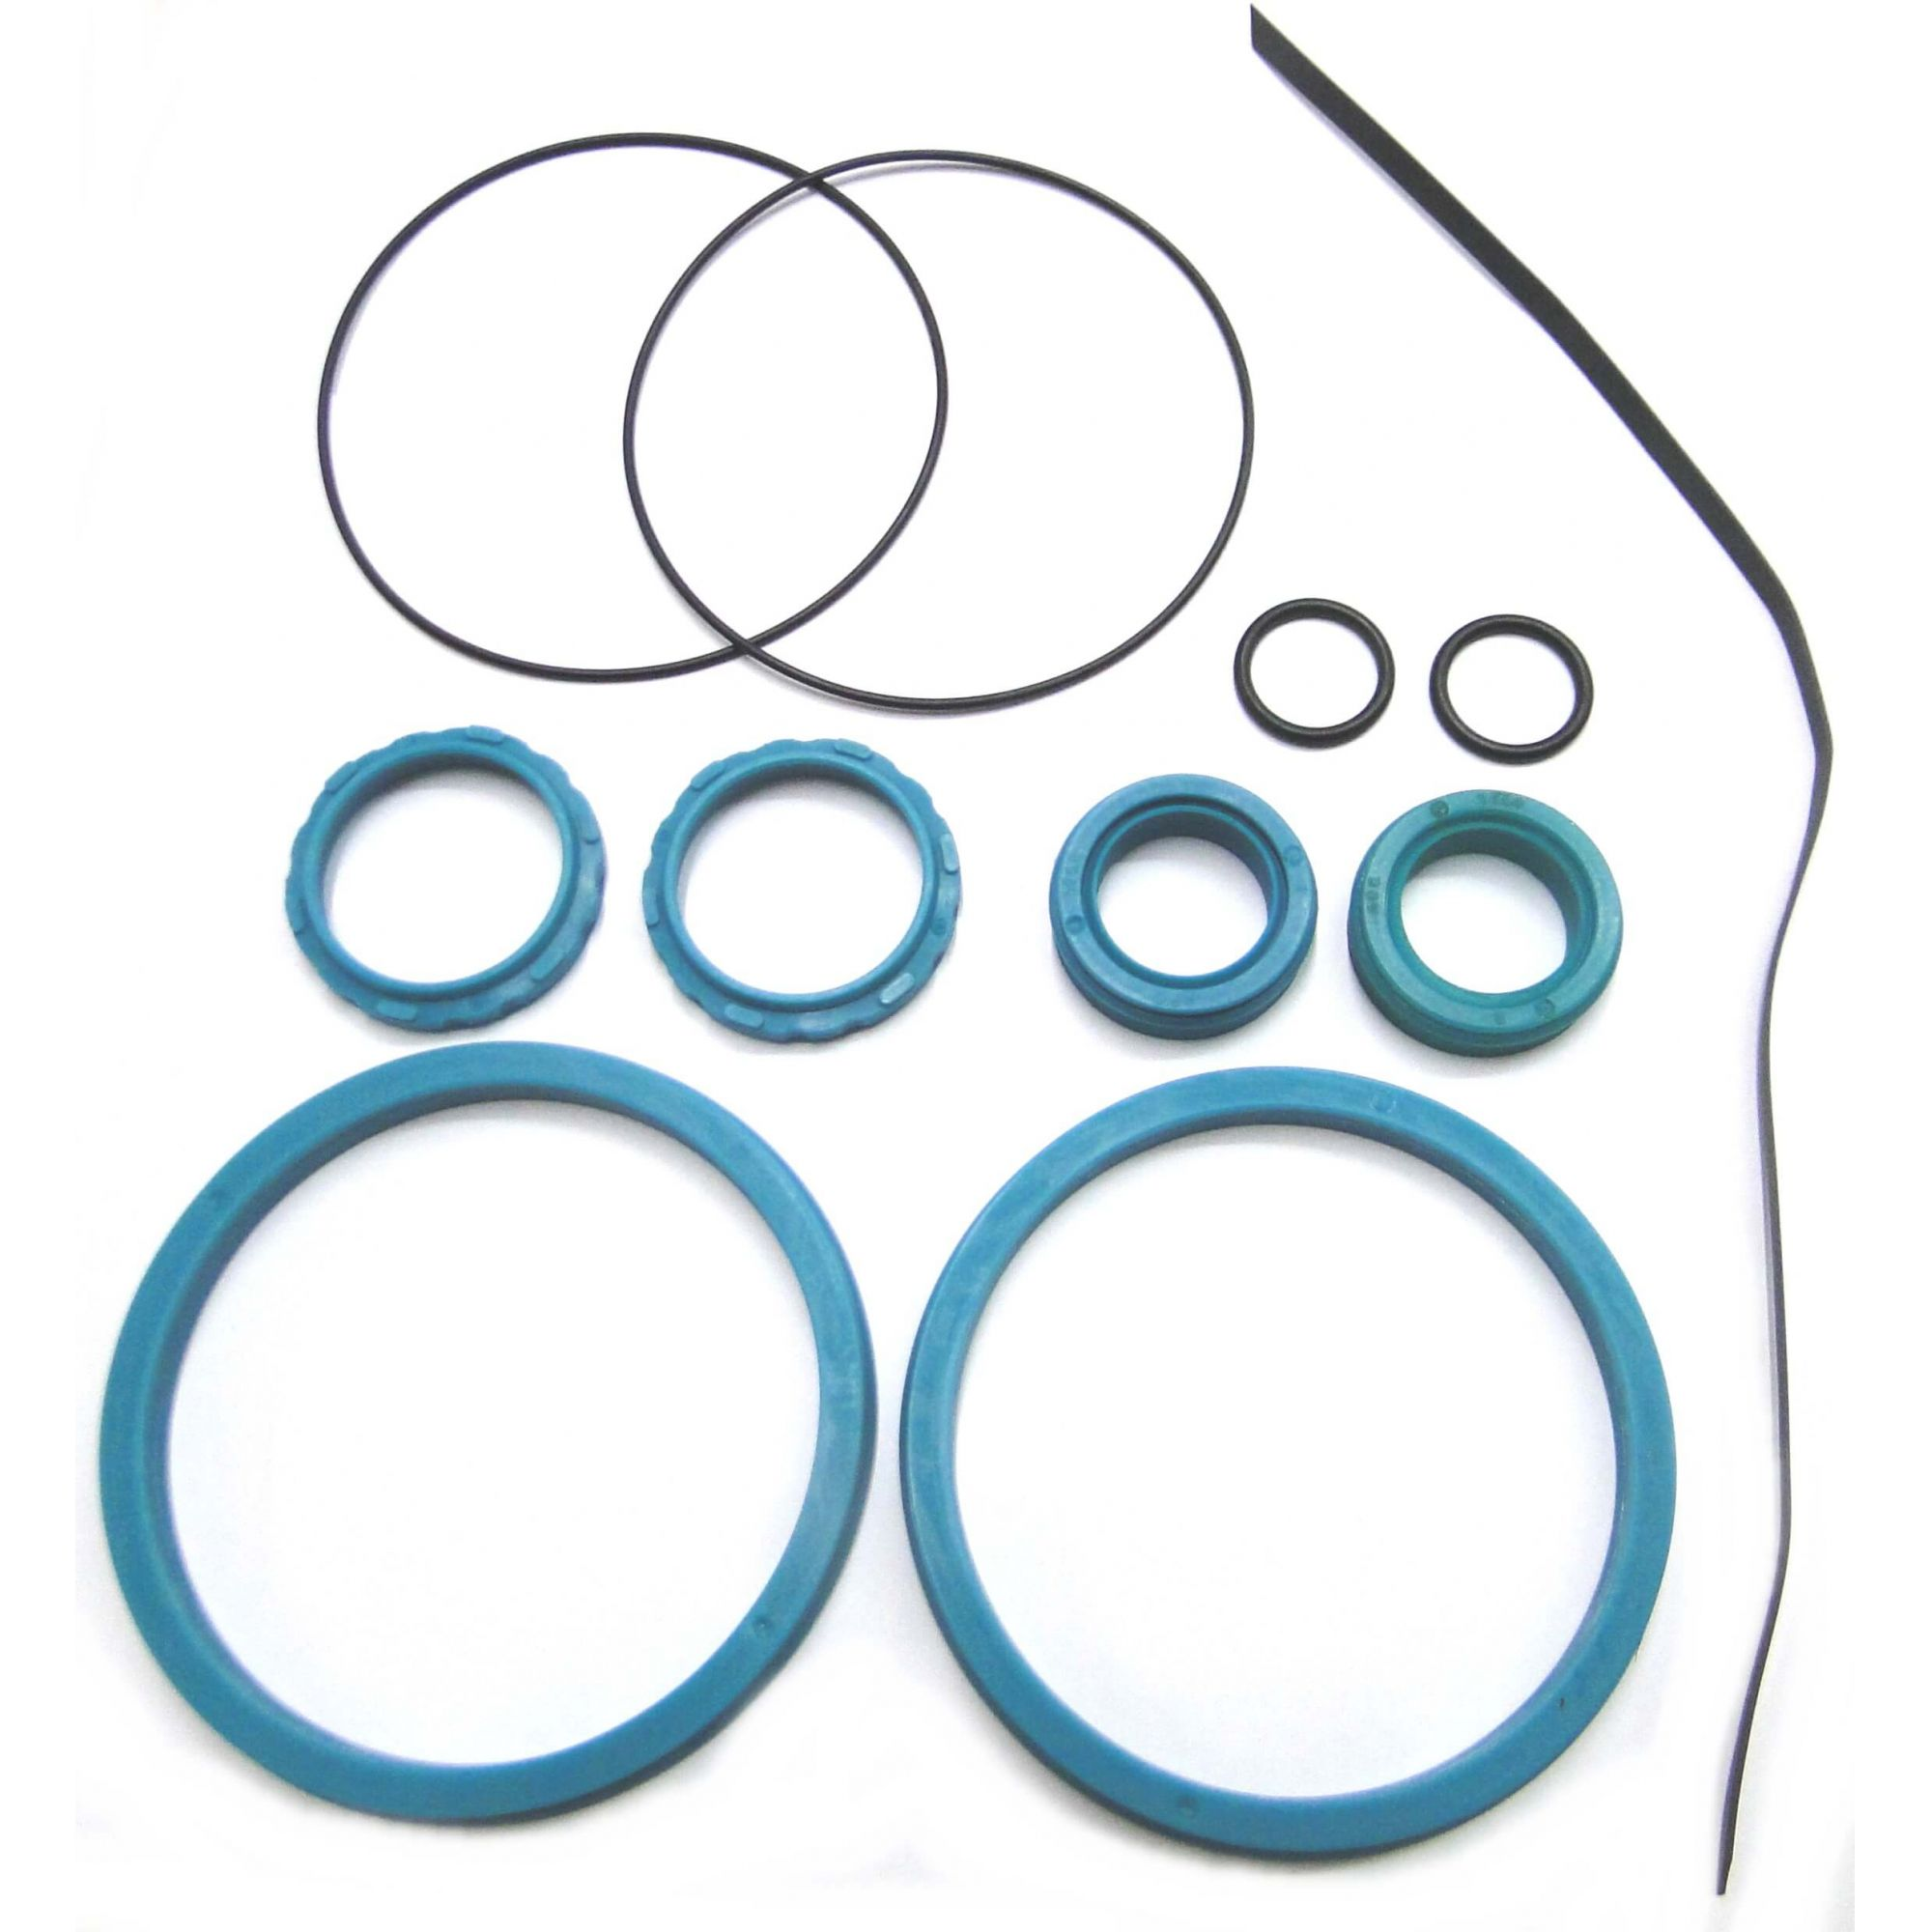 Kit Reparo para Cilindro Pneumático Haste Dupla E100 Werk Schott